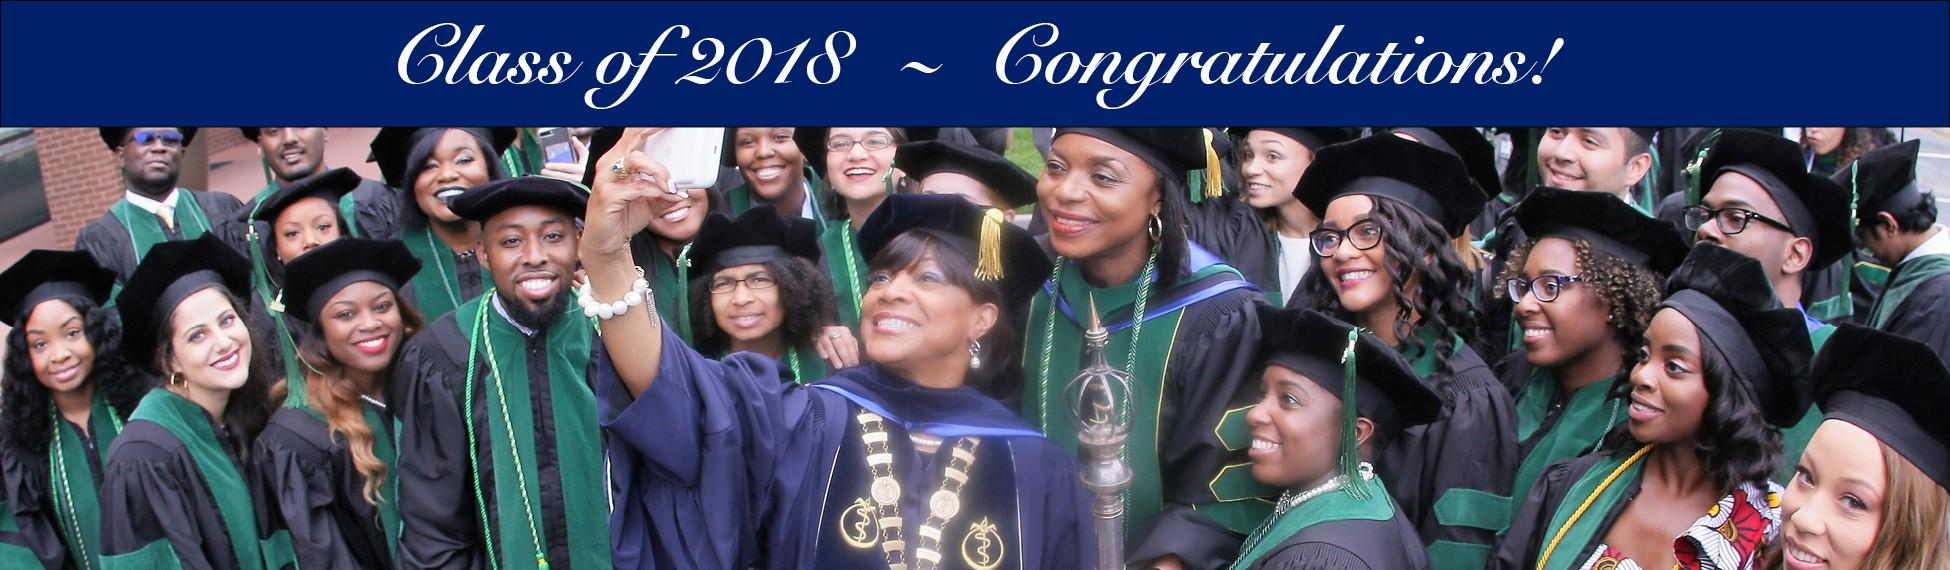 Class of 2018 - Congratulations!